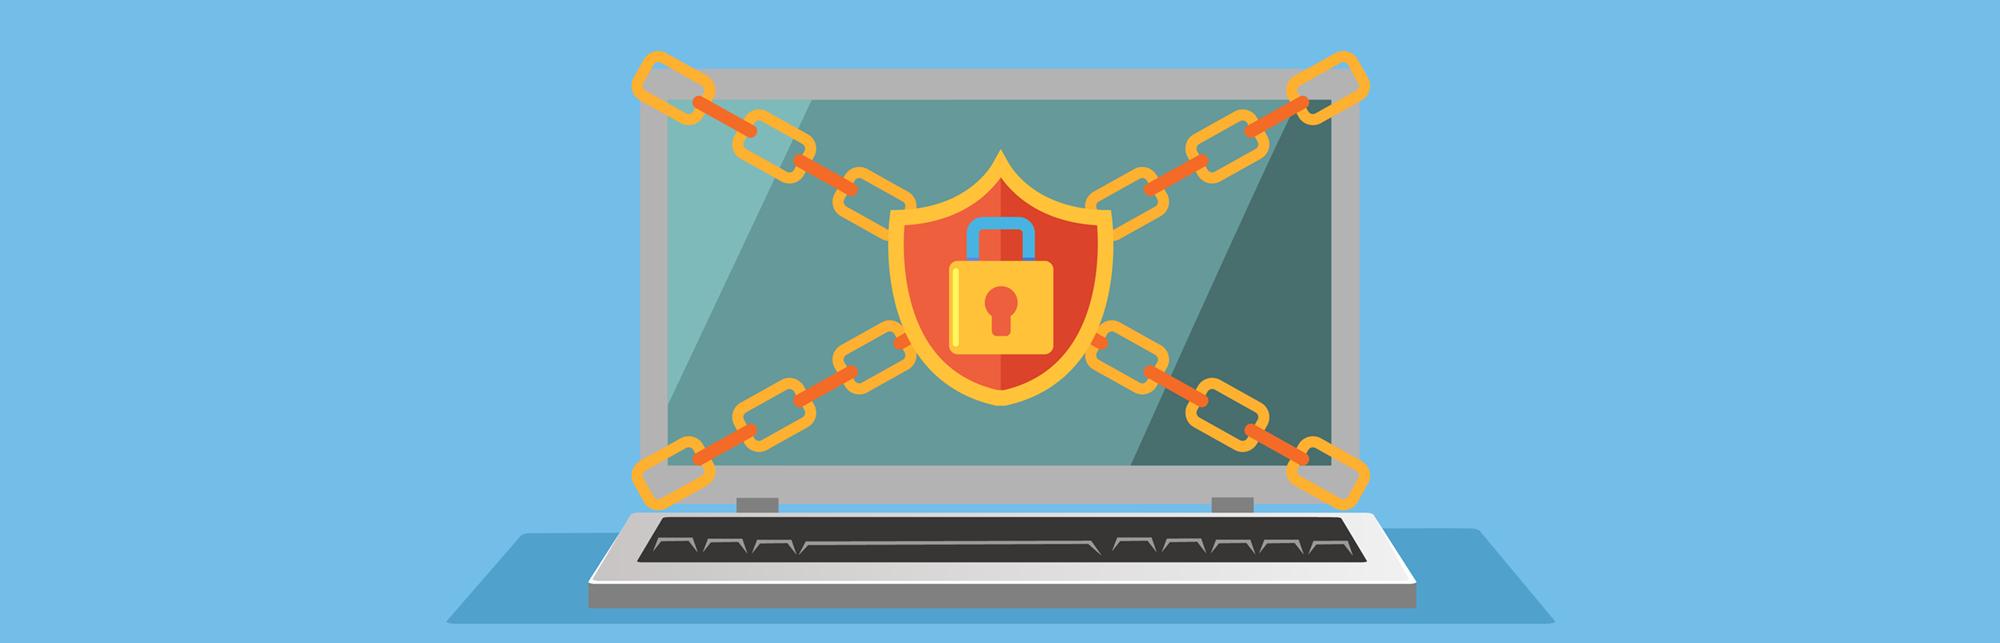 cybersecurity_154667054-blog